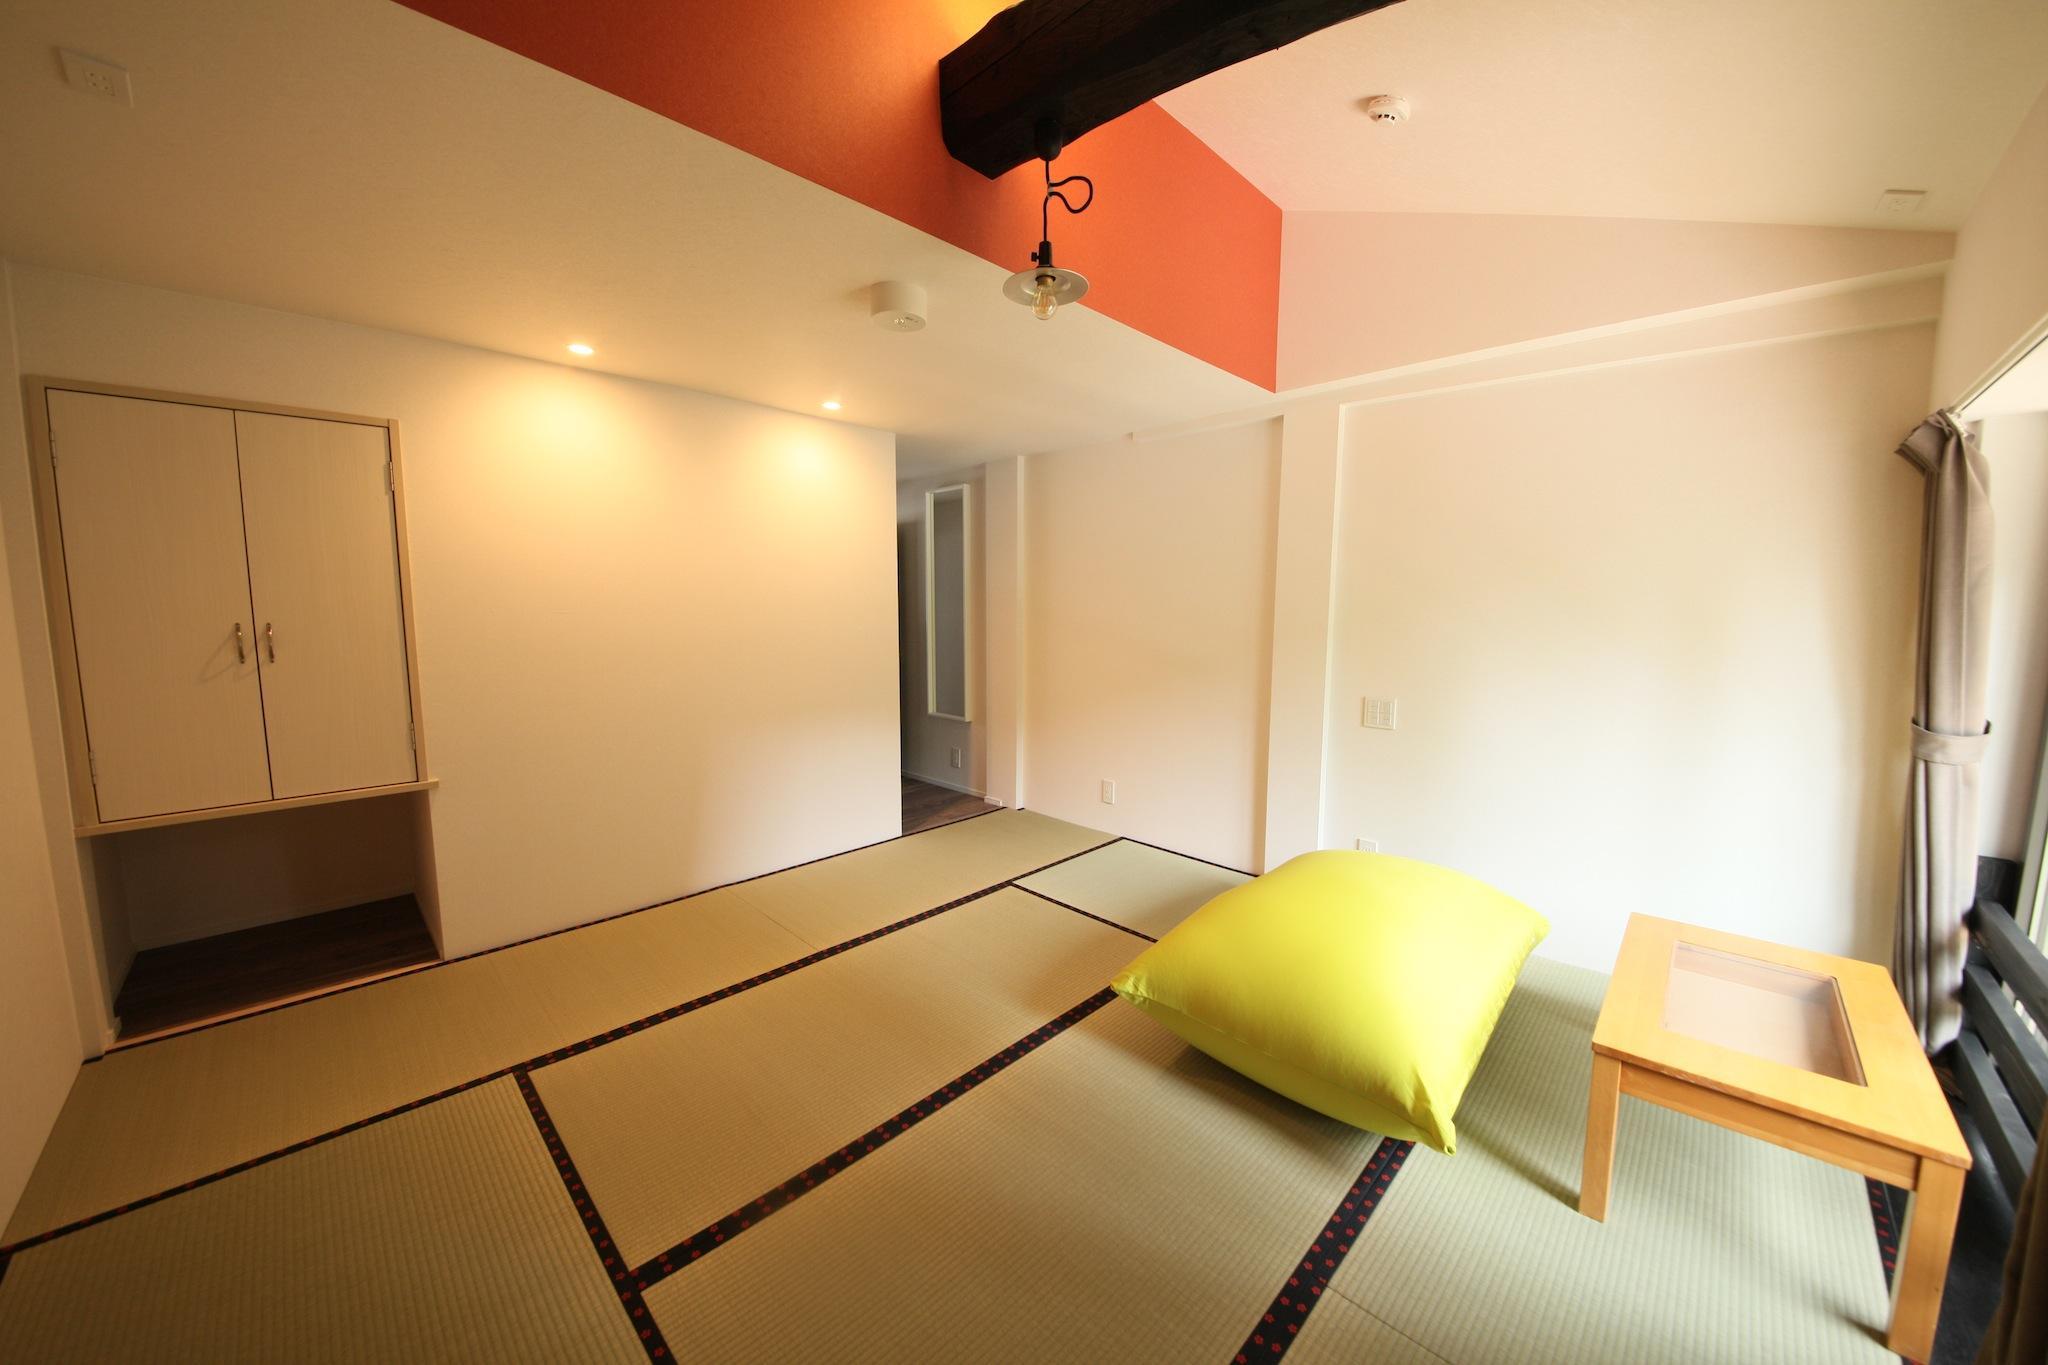 en ideas floors photos floor save japanese design this muji bed condominium bedroom atap style malaysia photo co